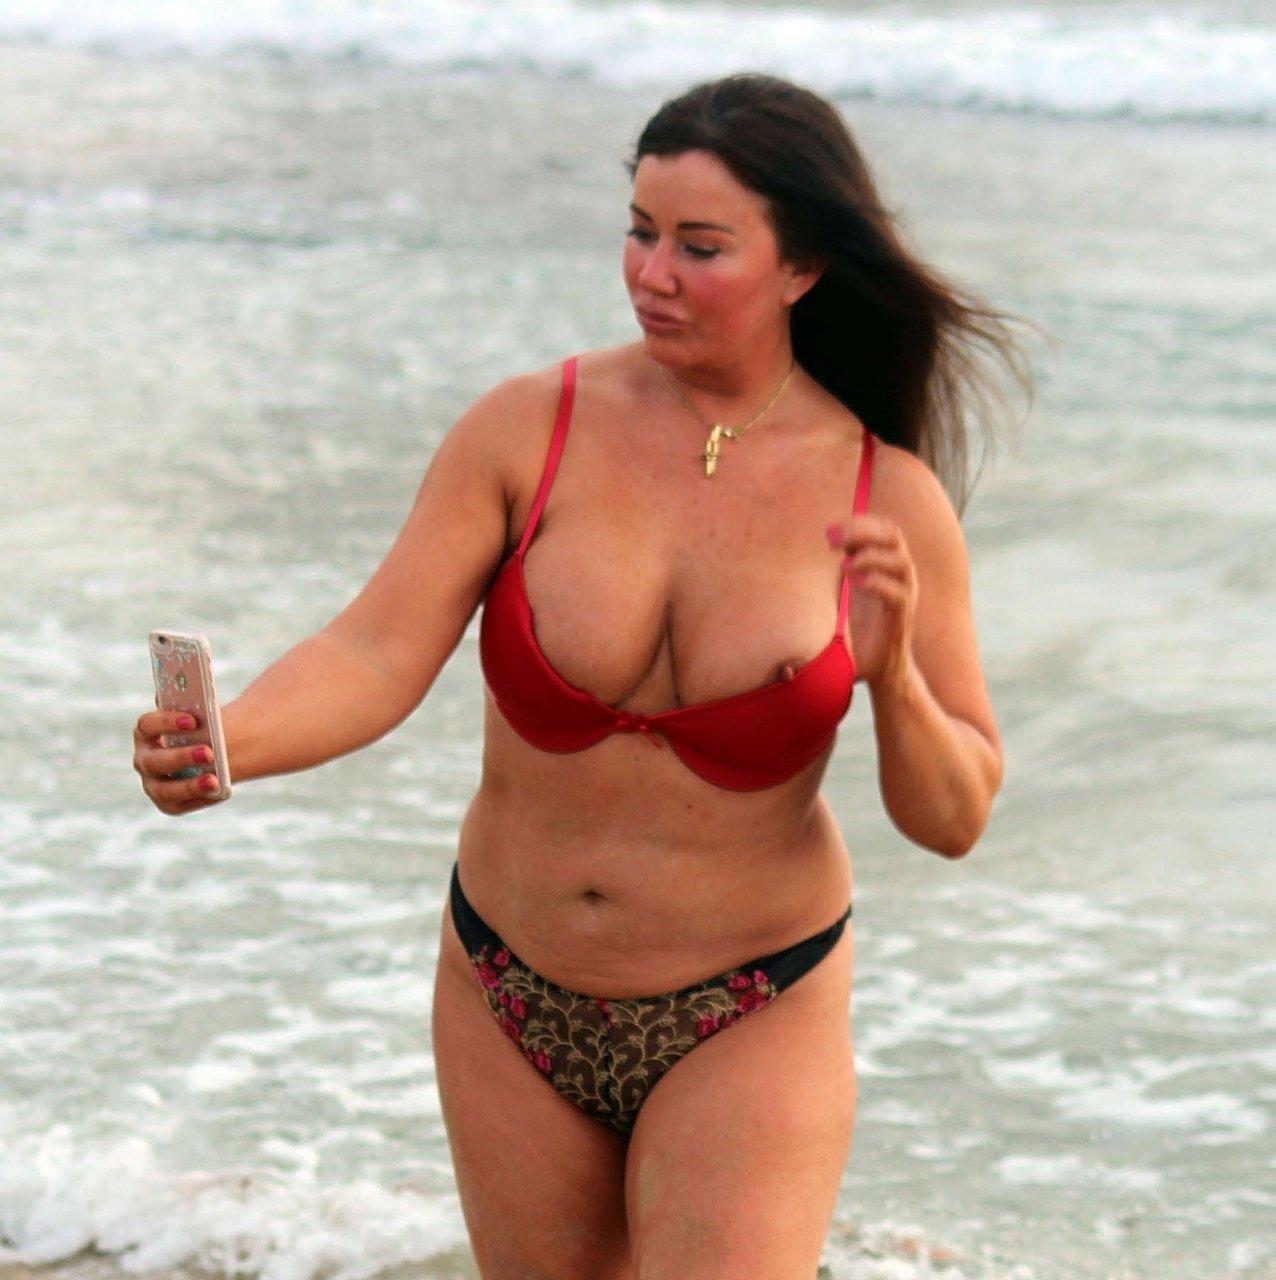 Hayley orrantia topless